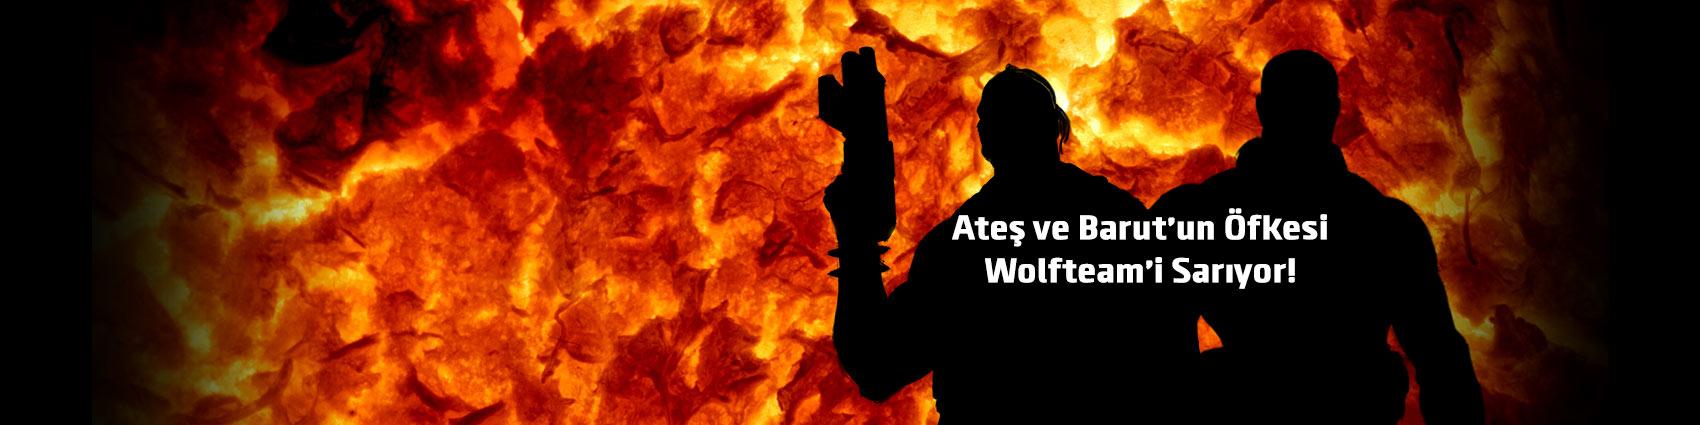 Ateş ve Barut